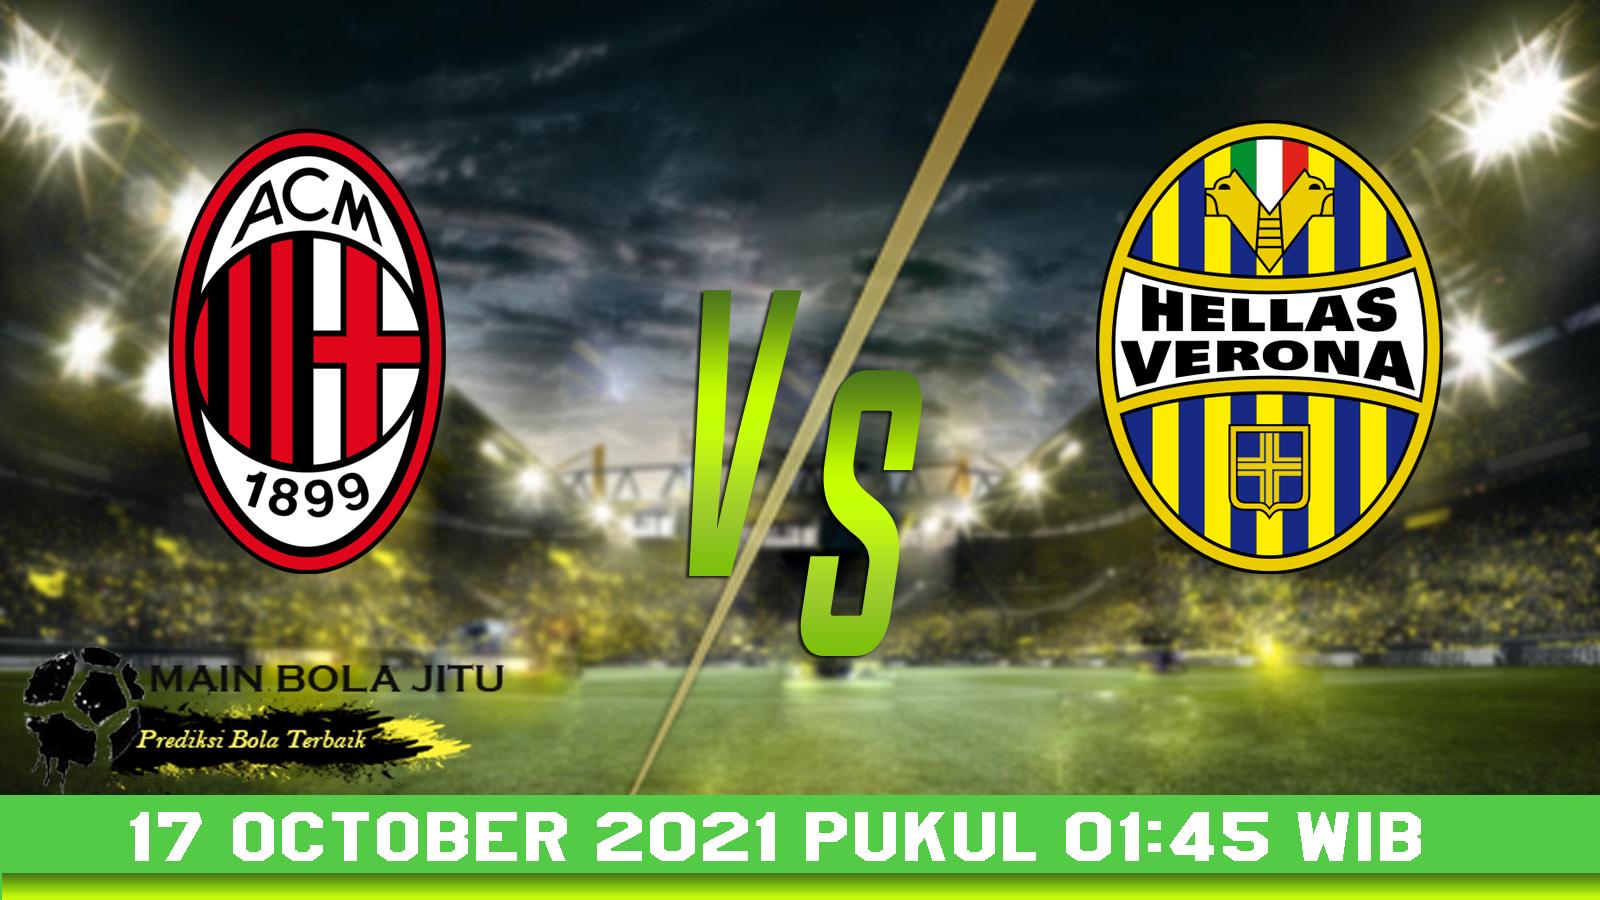 Prediksi Bola AC Milan Vs Hellas Verona